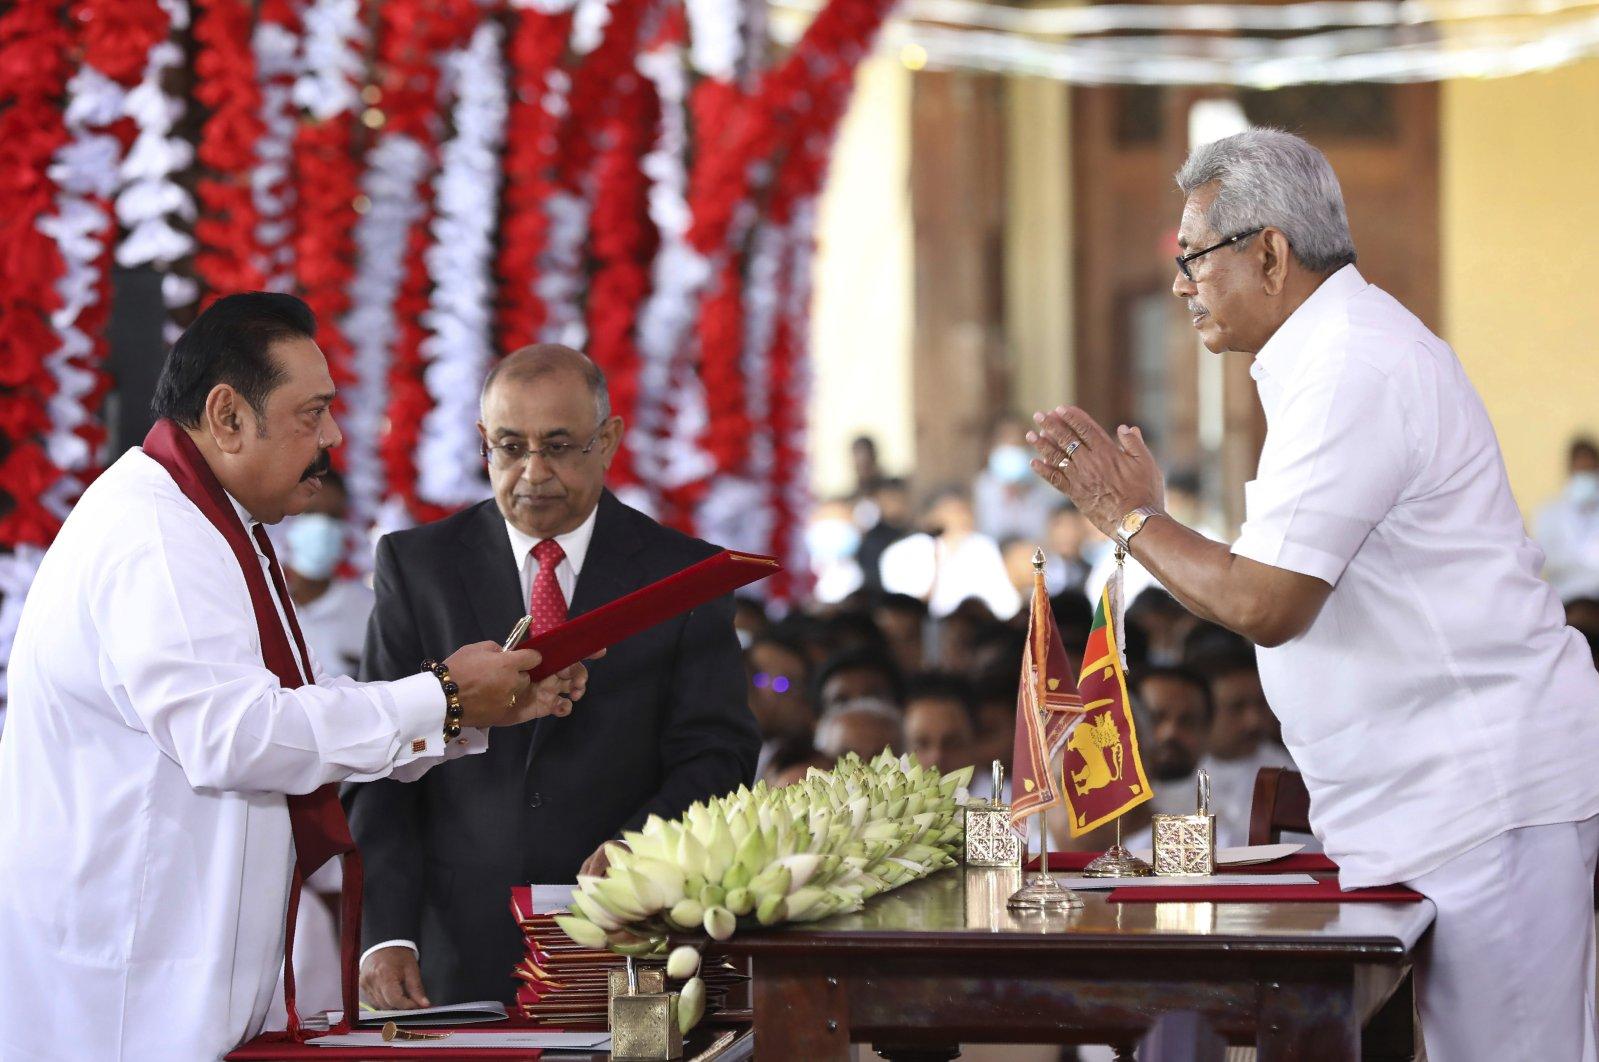 Sri Lankan President Gotabaya Rajapaksa (R) hands over credentials to his elder brother, Prime Minister Mahinda Rajapaksa during a ceremony, Kandy, Aug. 12, 2020. (AP Photo)